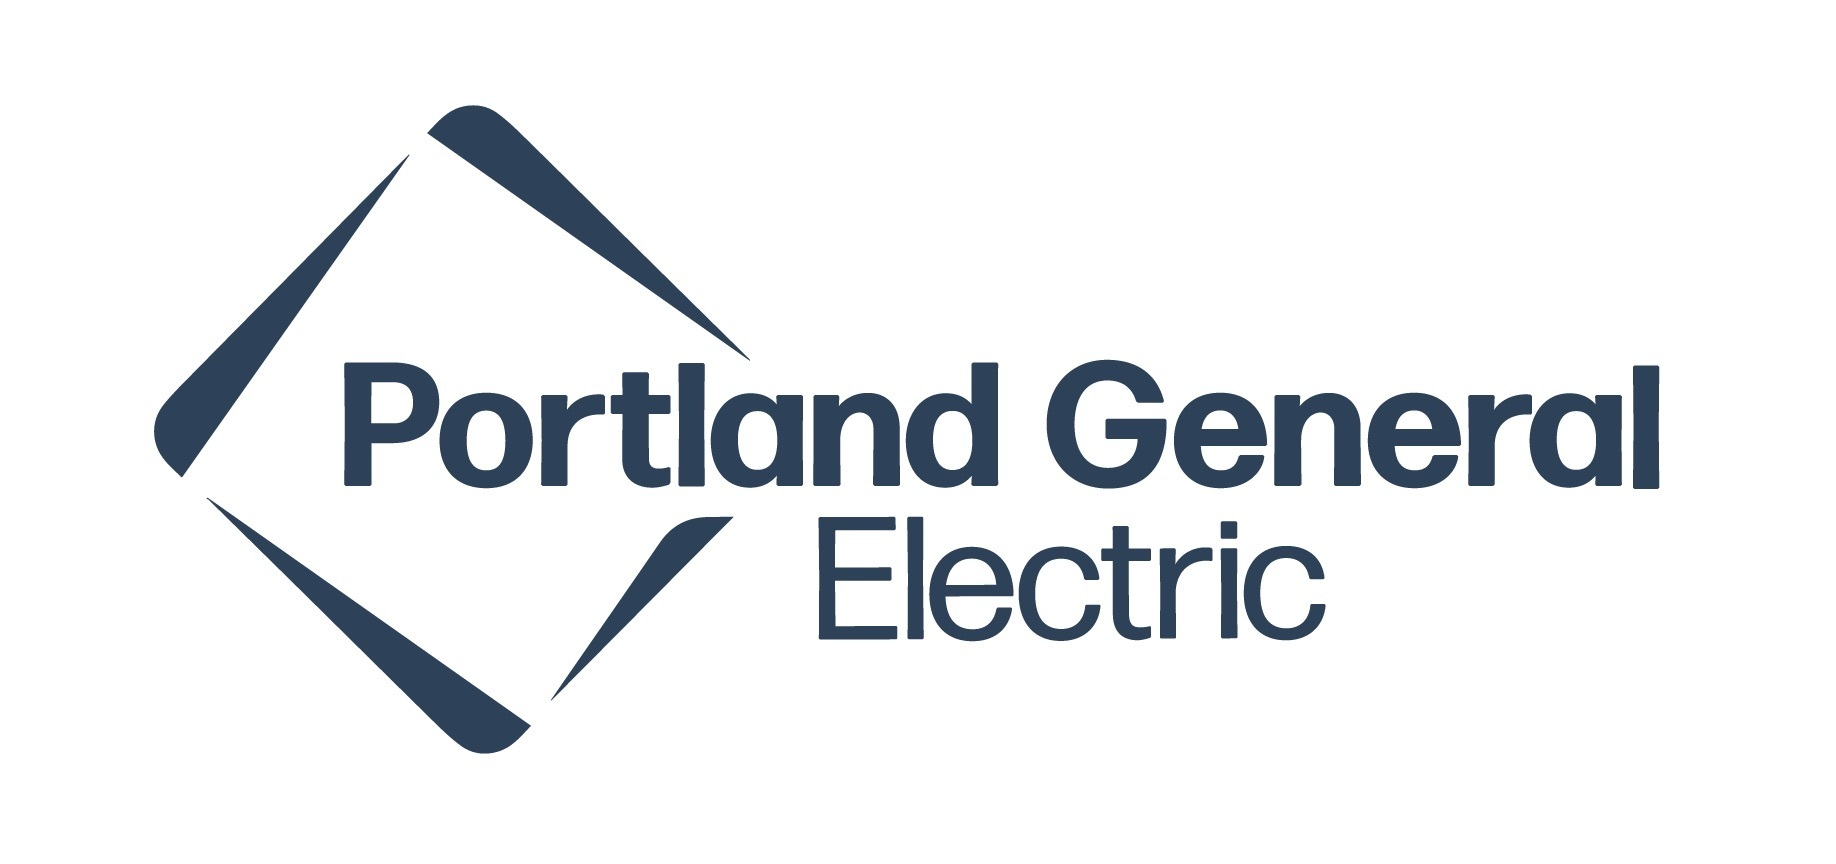 Portland General Electric Declares Dividend